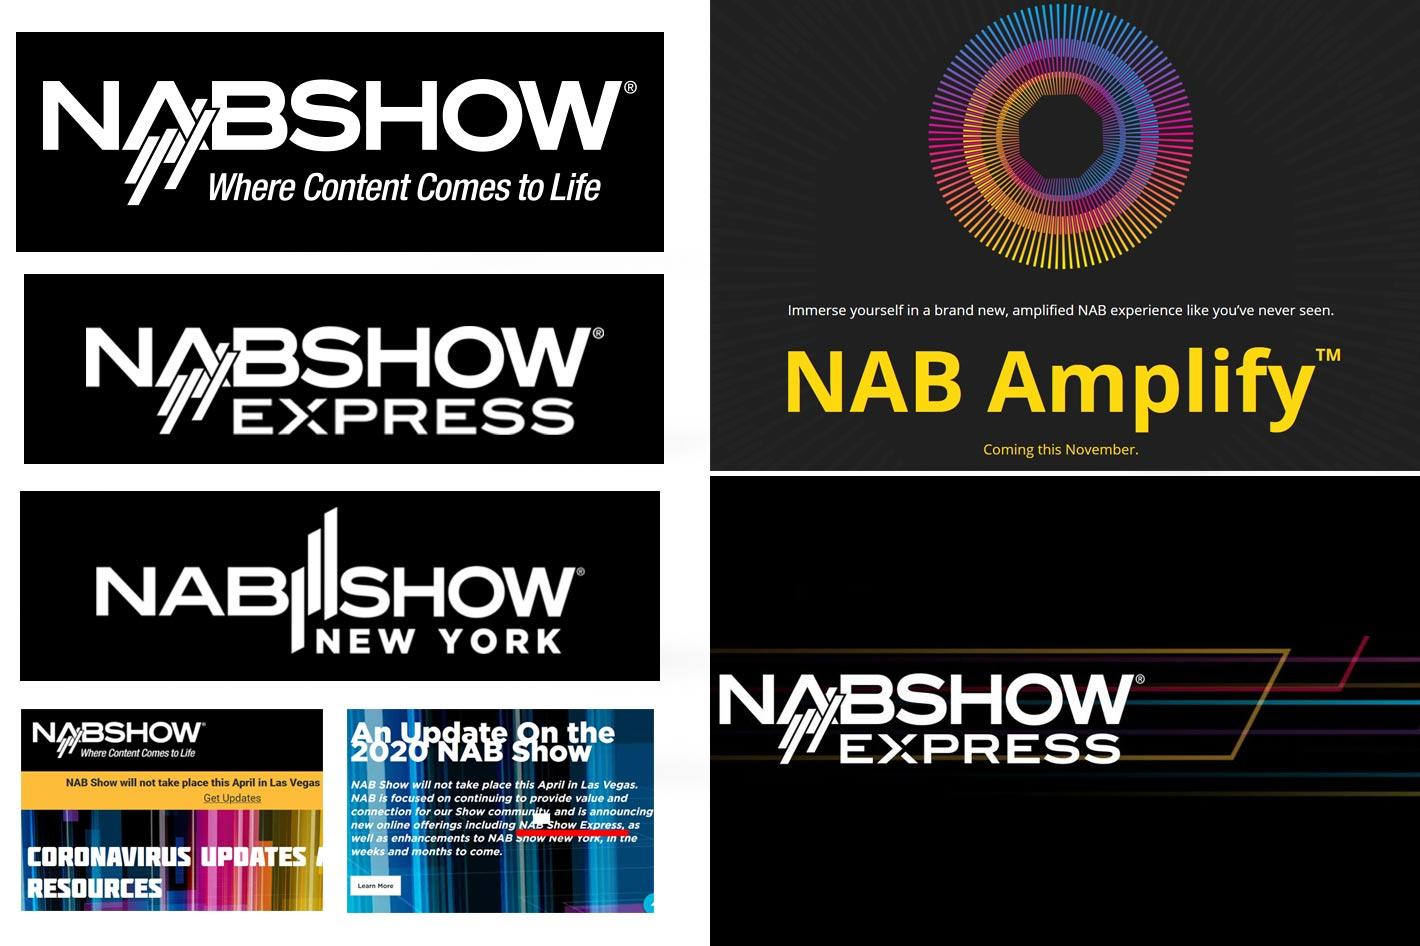 NAB Show launches a new digital platform, NAB Amplify